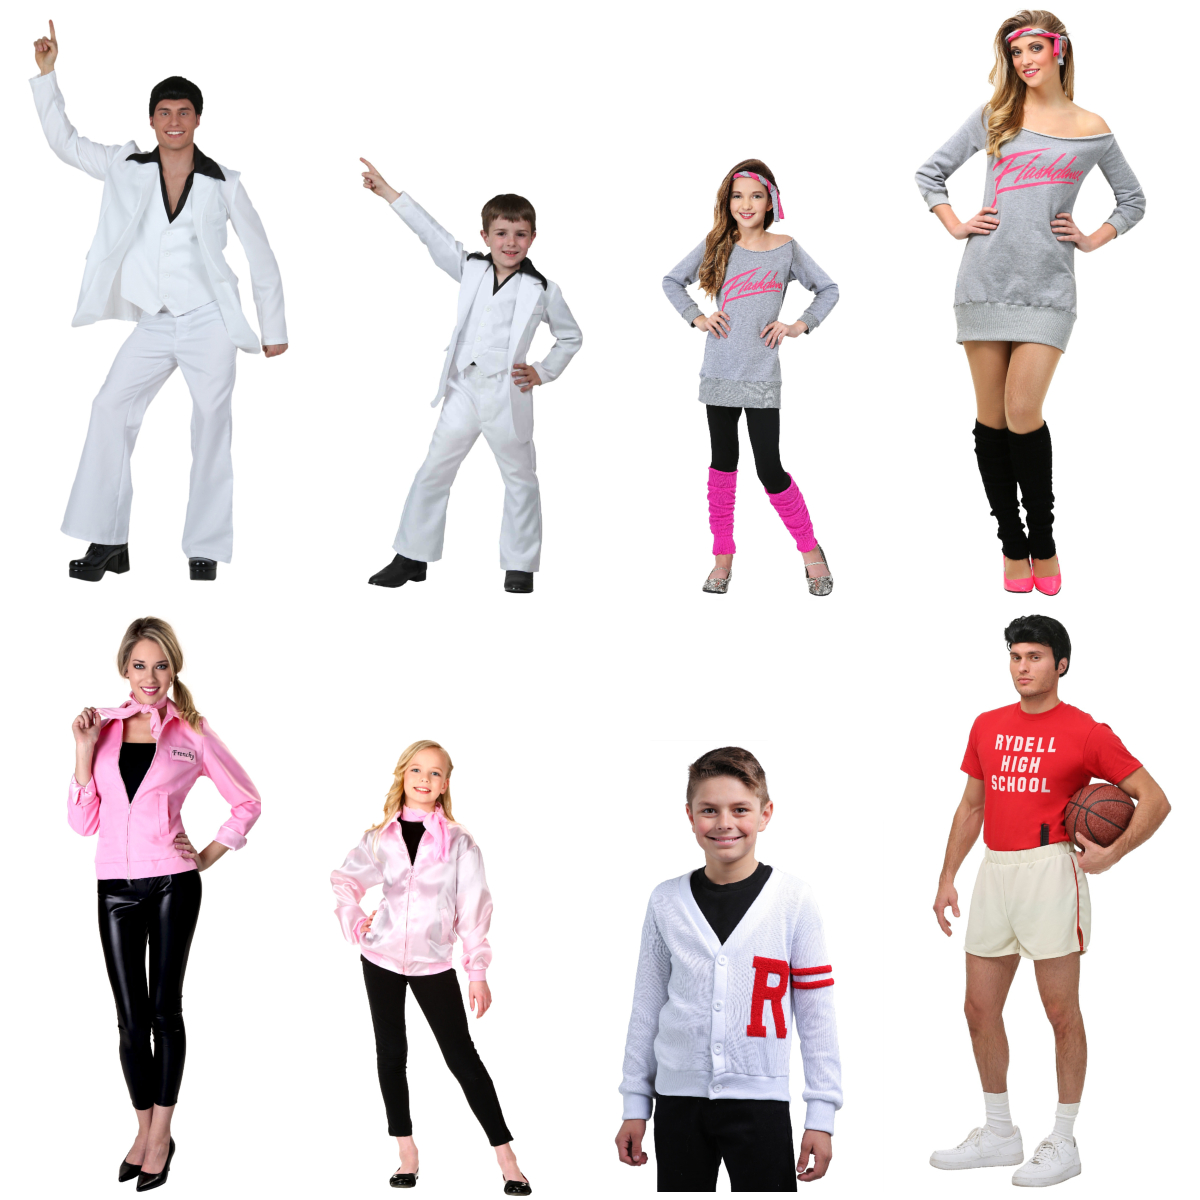 Best Dancing Movie Costumes